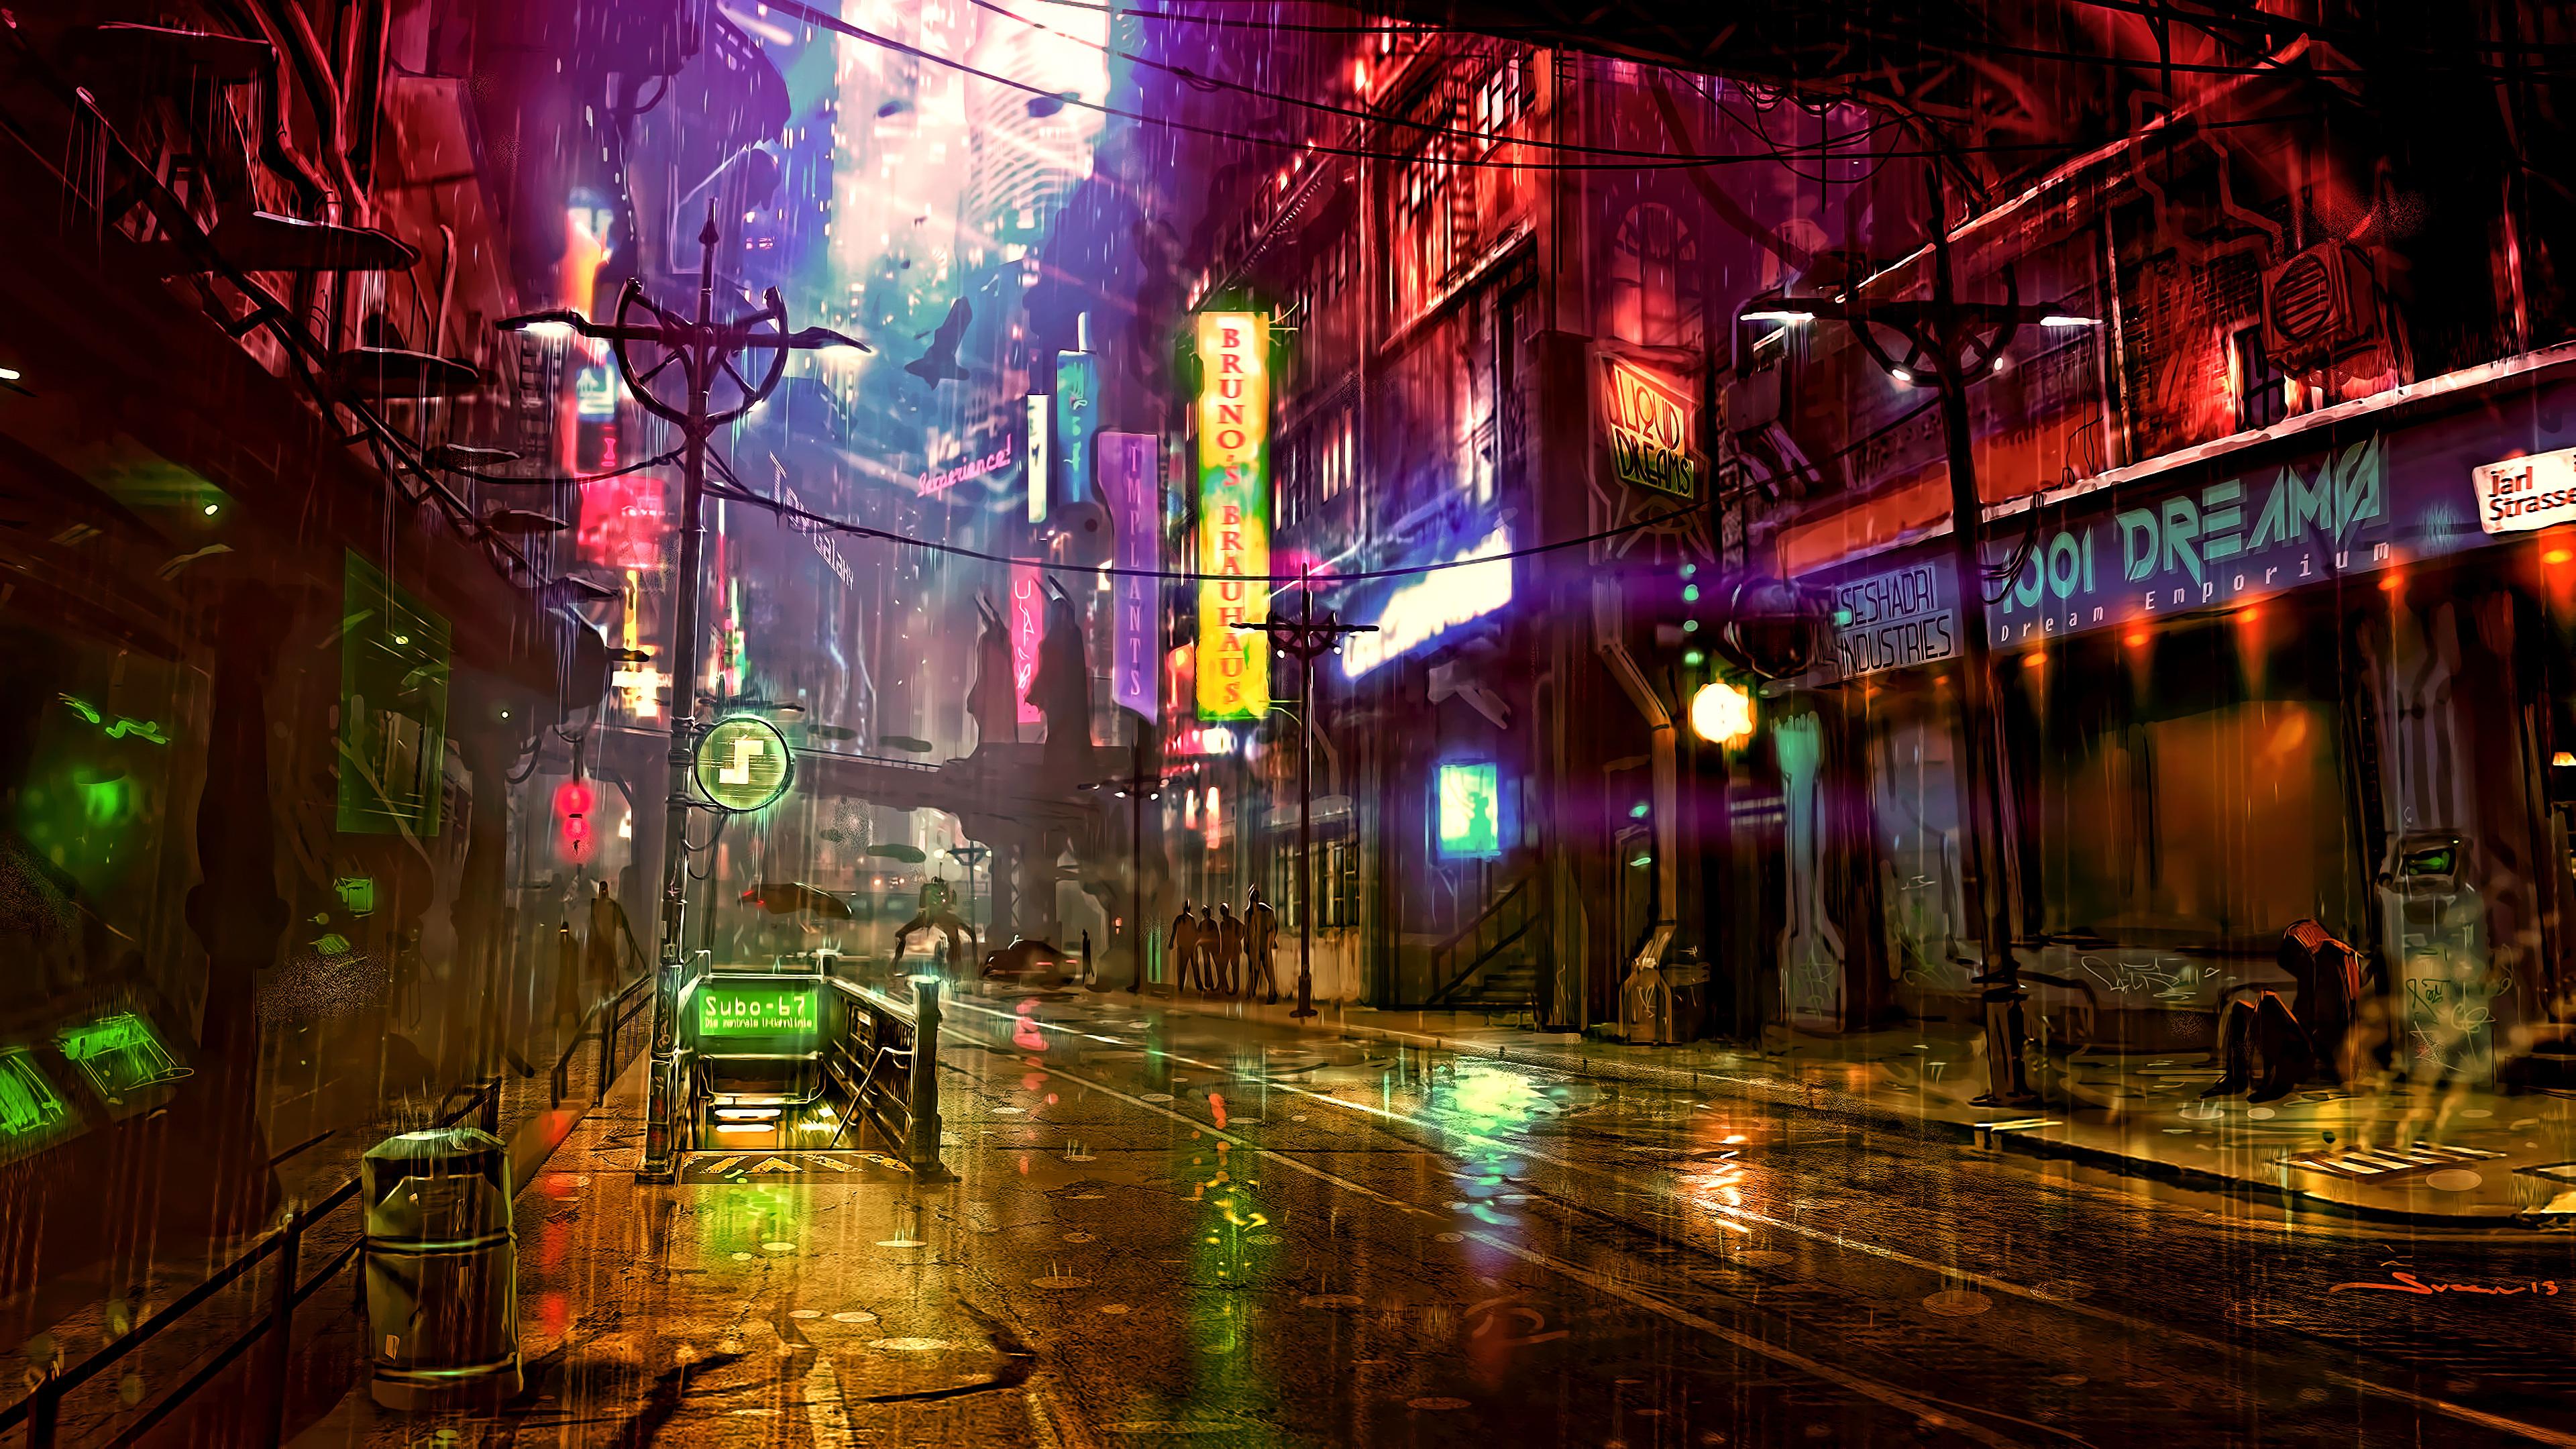 Futuristic City Cyberpunk Neon Street Digital Art 4k